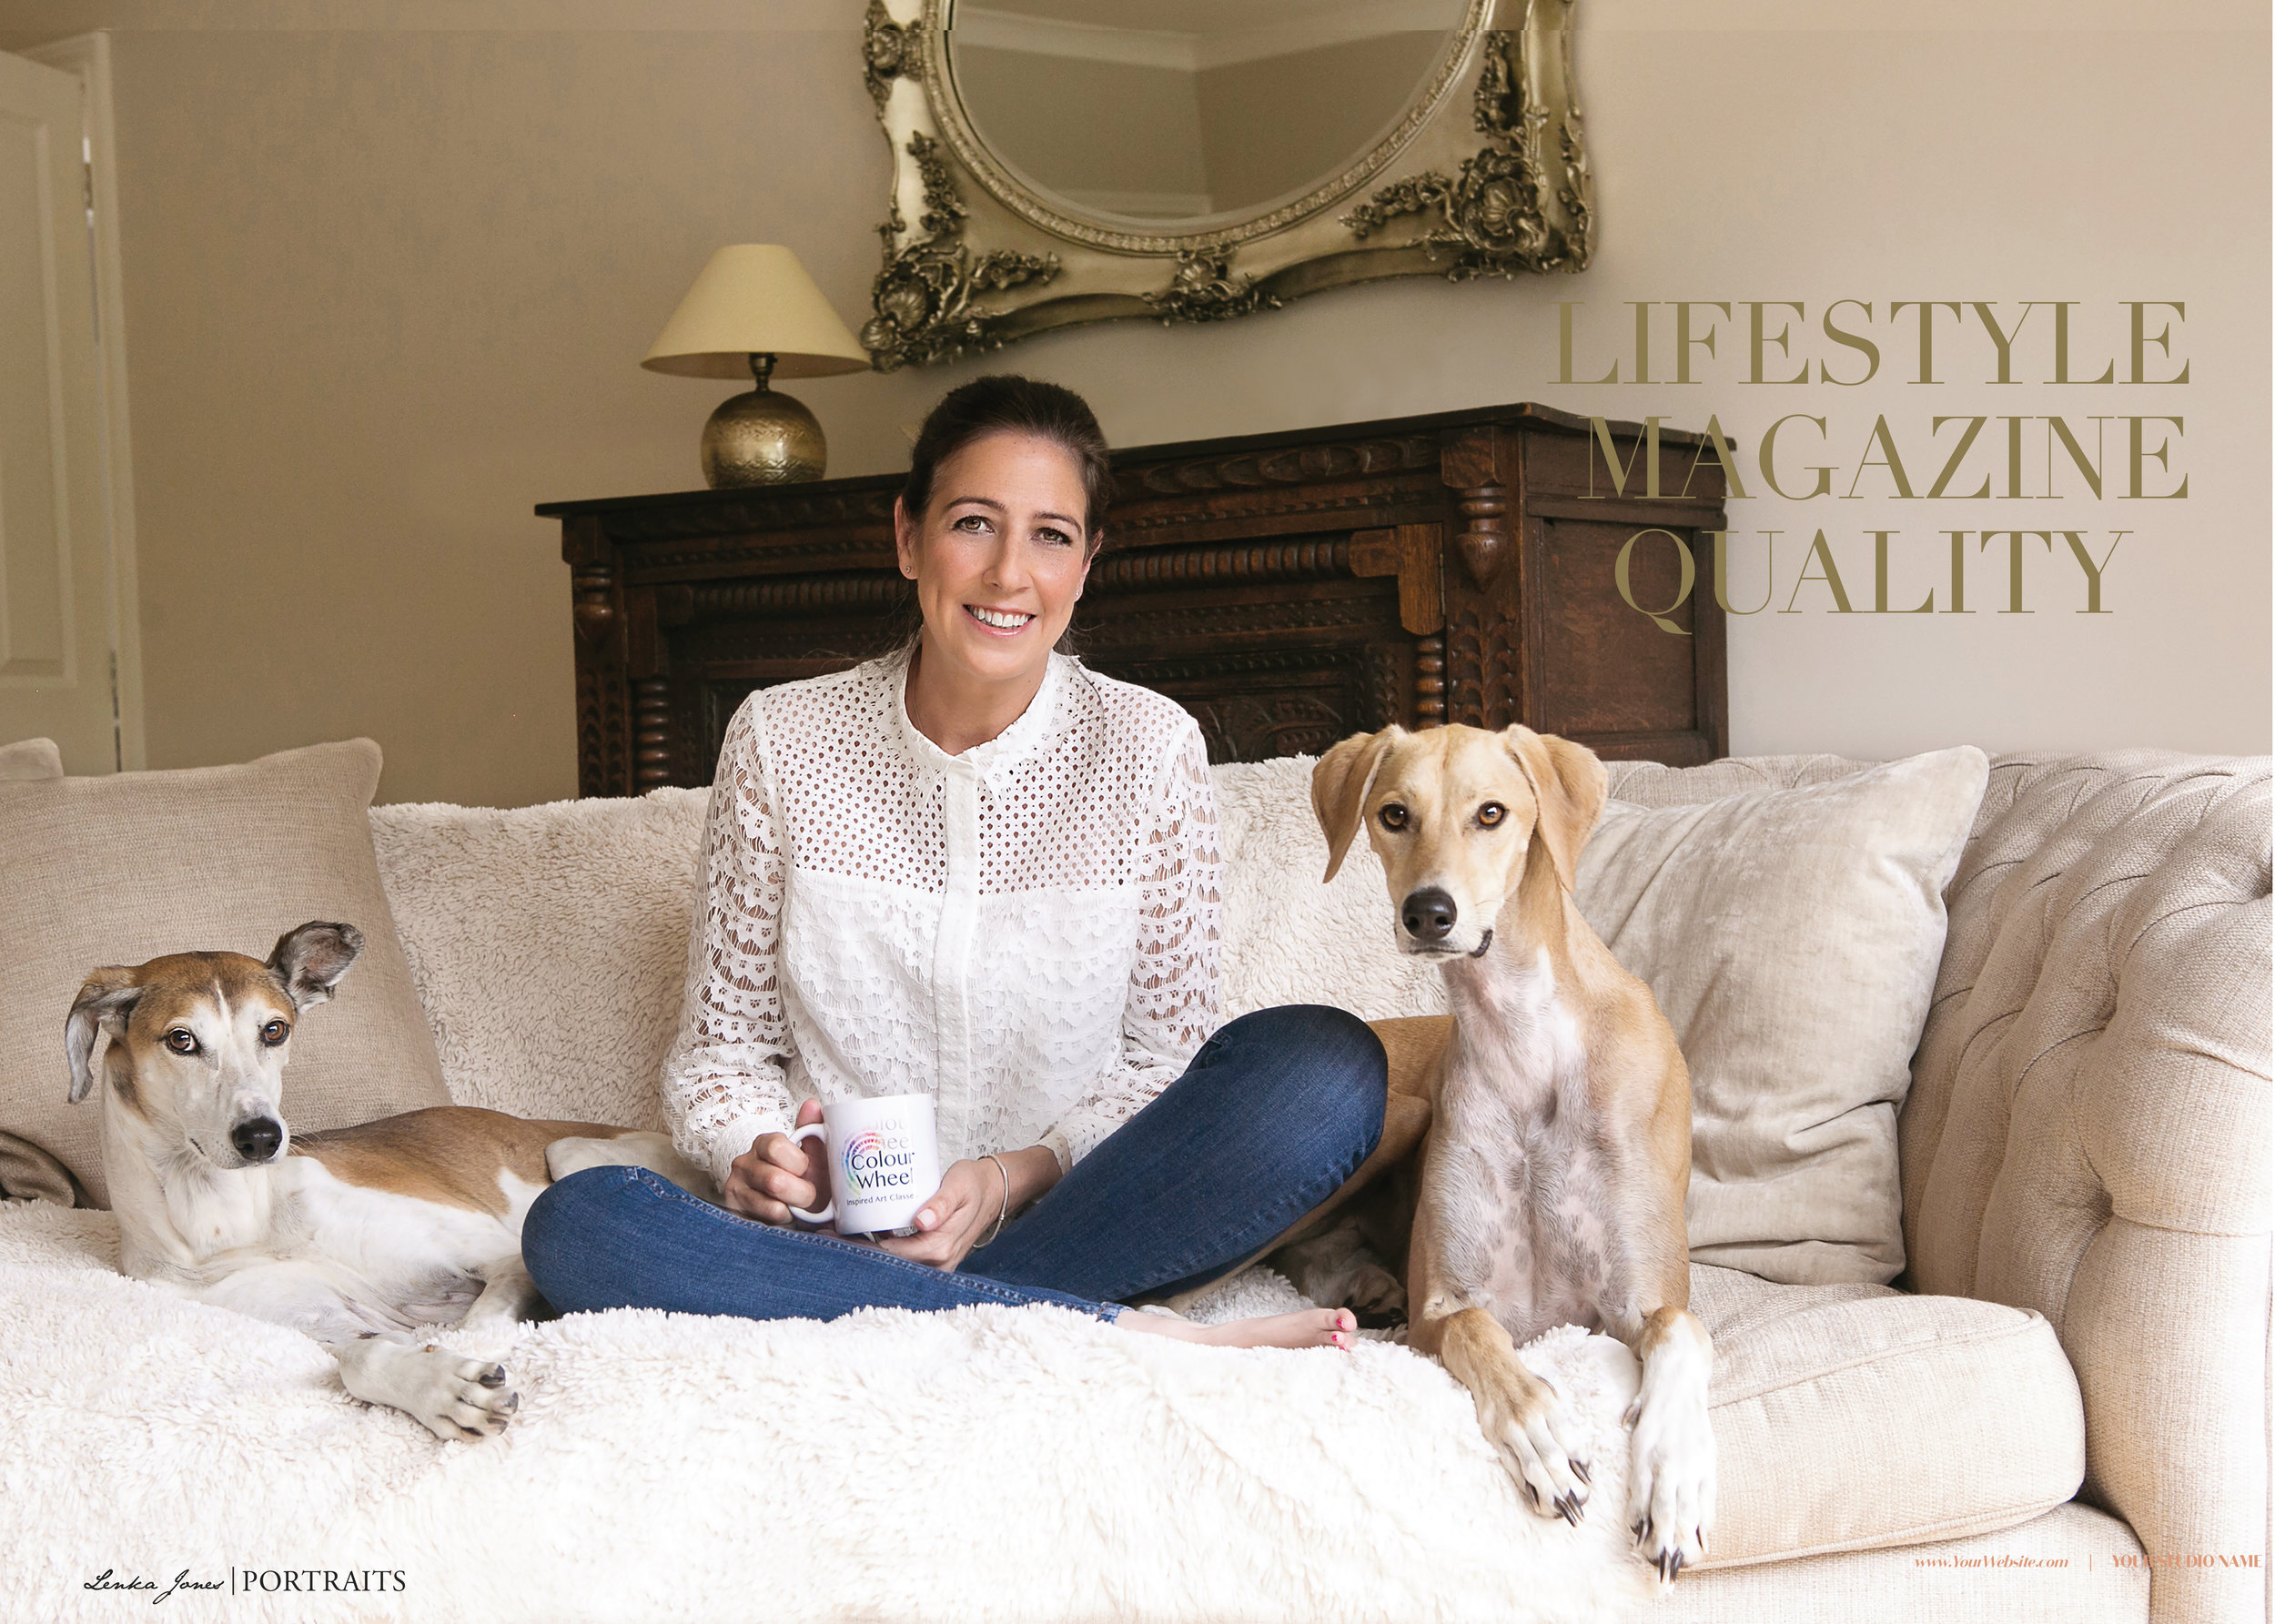 Pesonal Branding Photo shoot with Lenka Jones